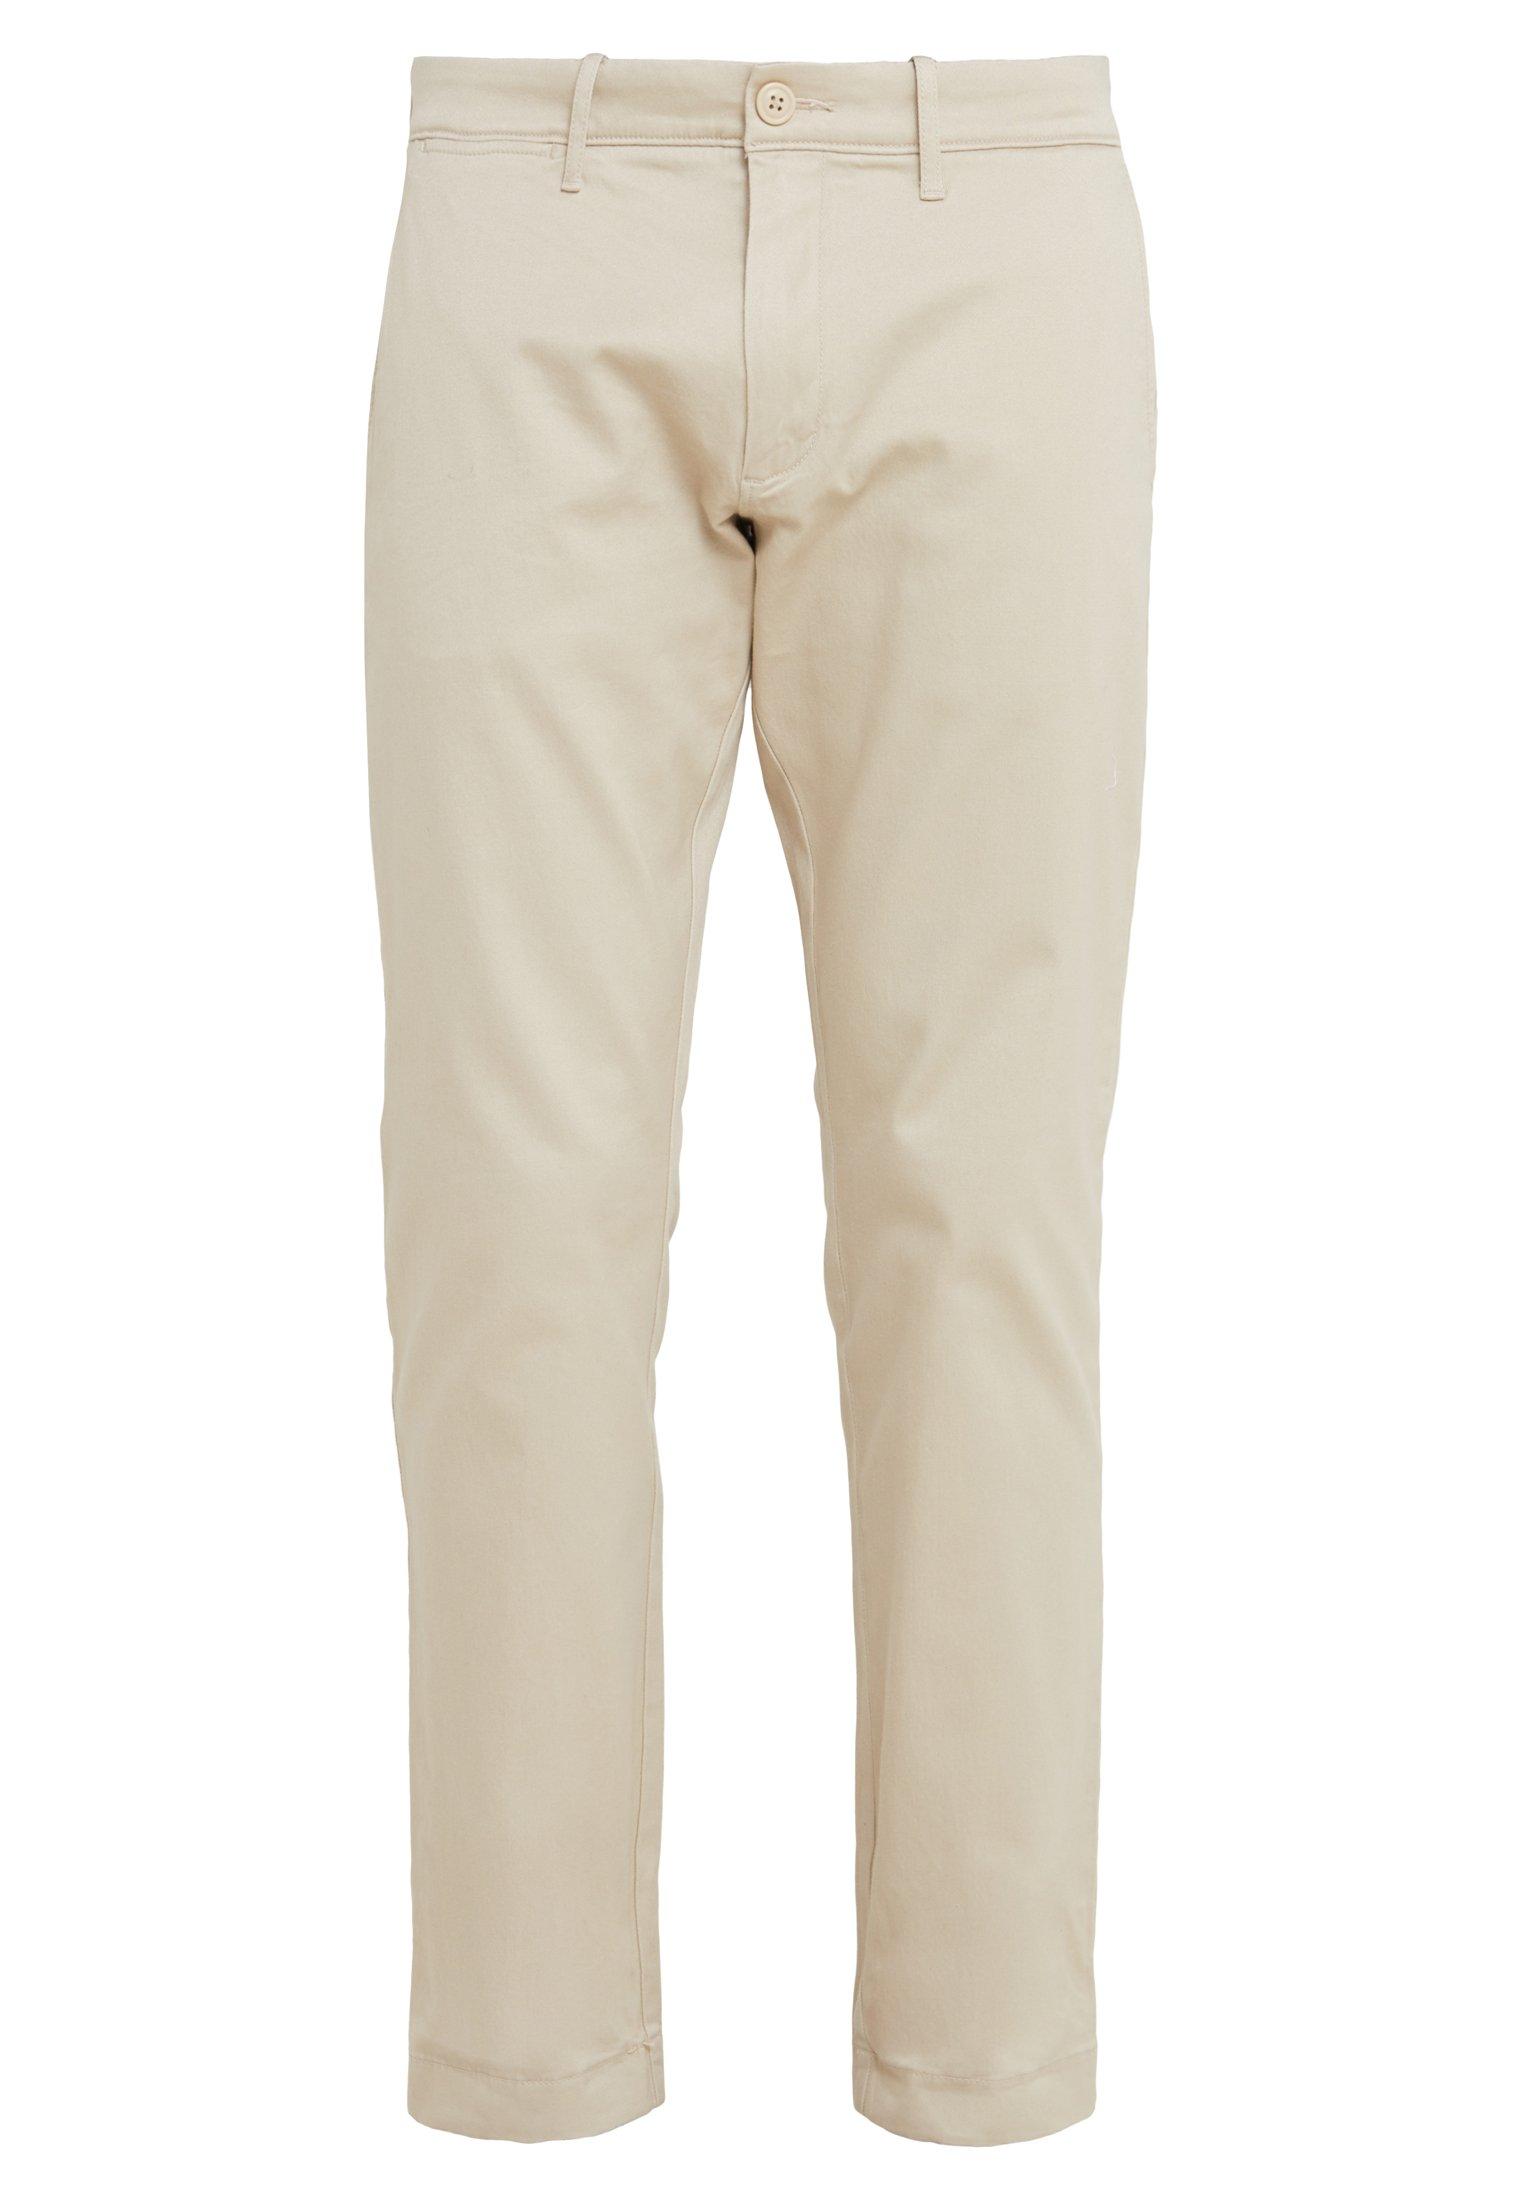 J.CREW MENS PANTS - Chino - beige